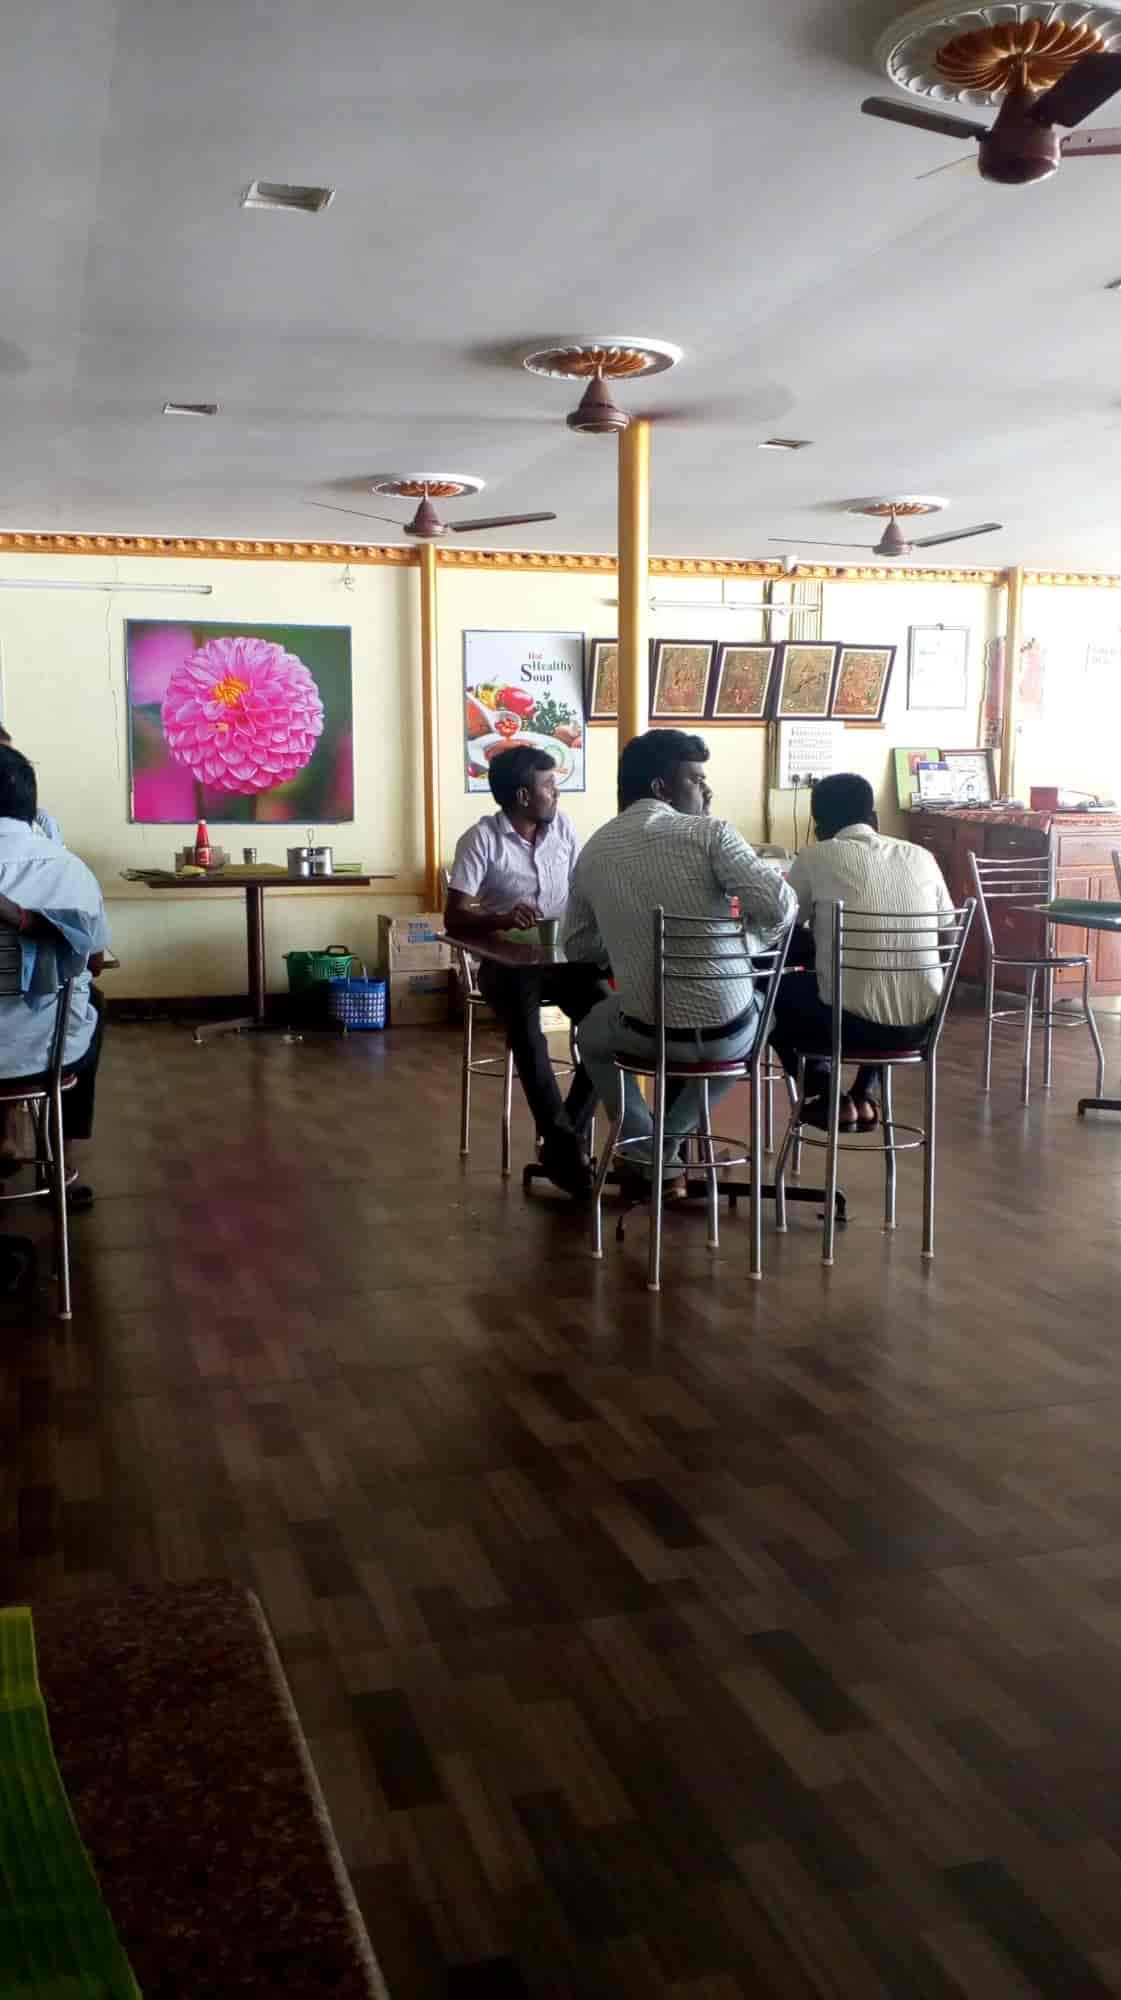 Awesome Top Restaurants In Karaikudi Bus Stand Serving Buffet Interior Design Ideas Skatsoteloinfo